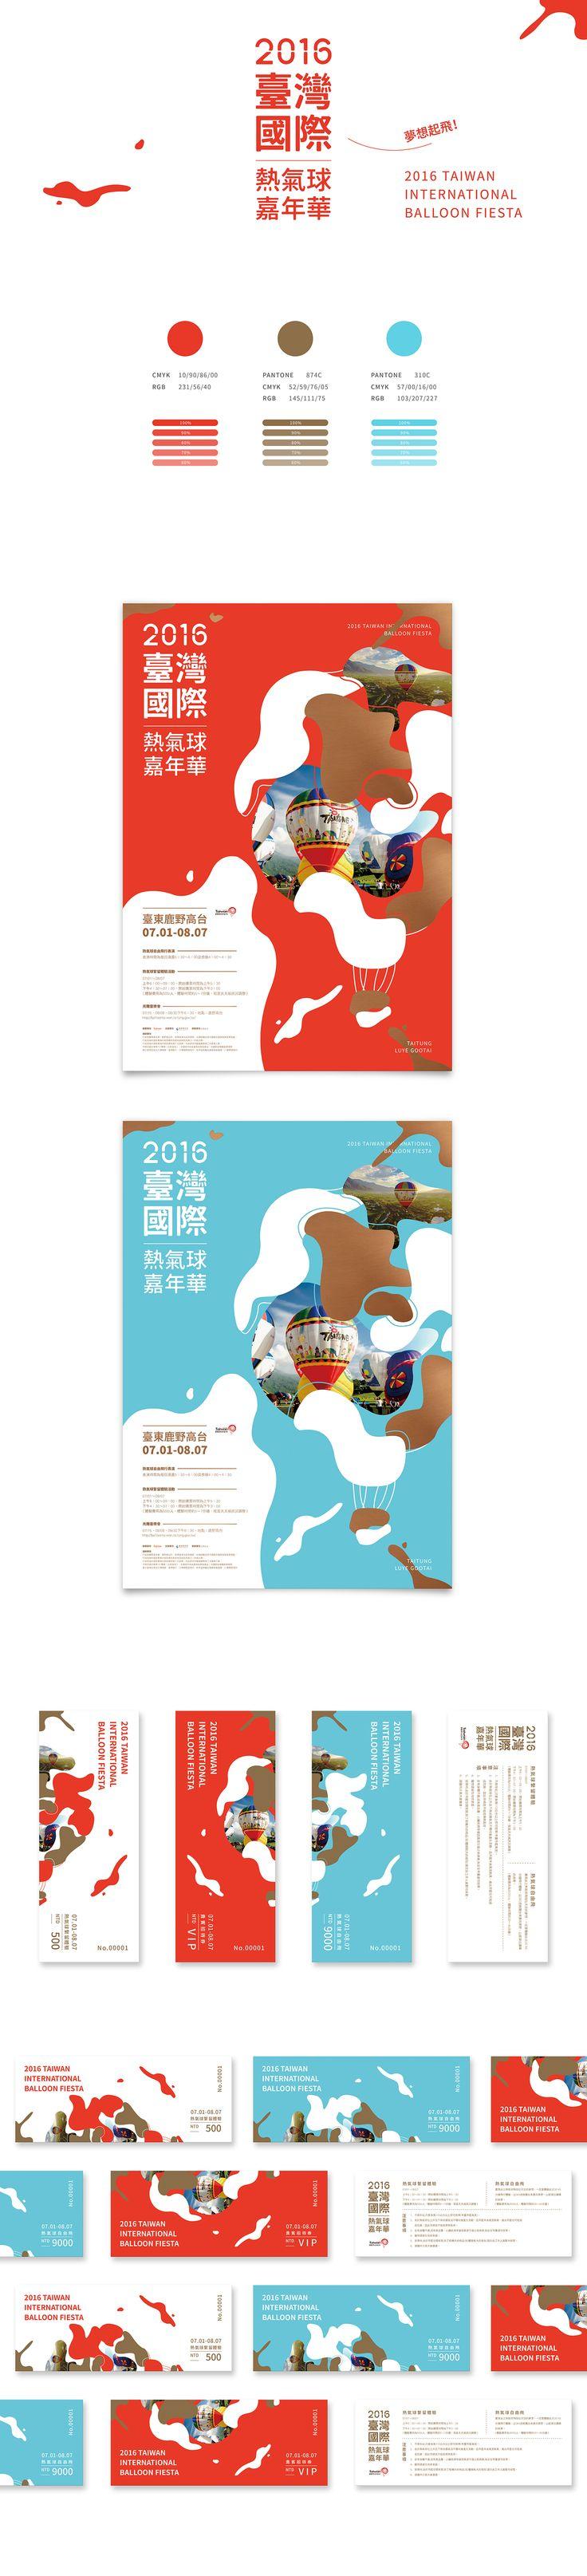 《2016臺灣國際熱氣球嘉年華》TAIWAN INTERNATIONAL BALLOON FIESTA on Behance